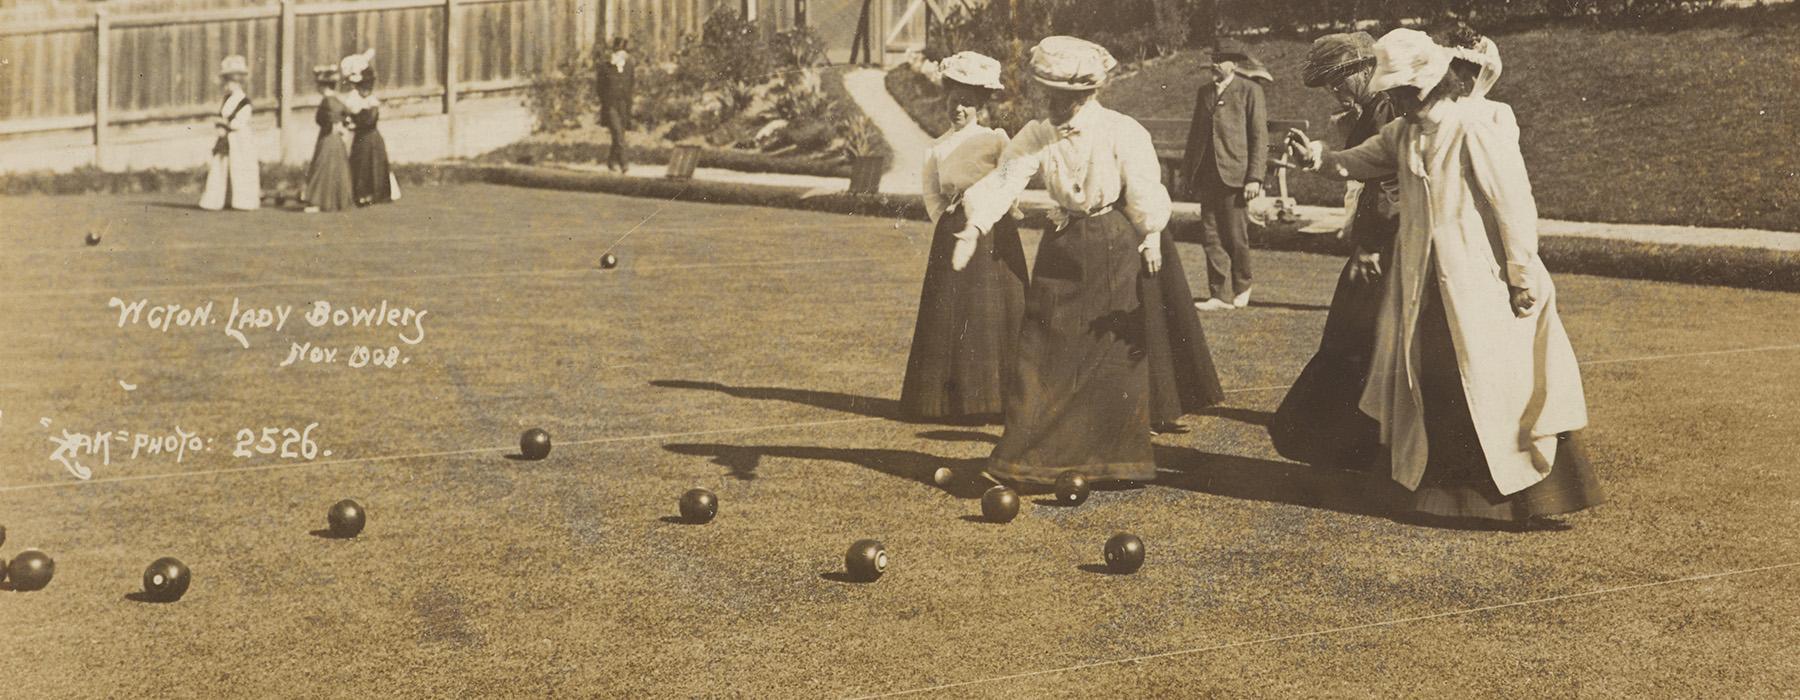 Wellington lady bowlers, 1908